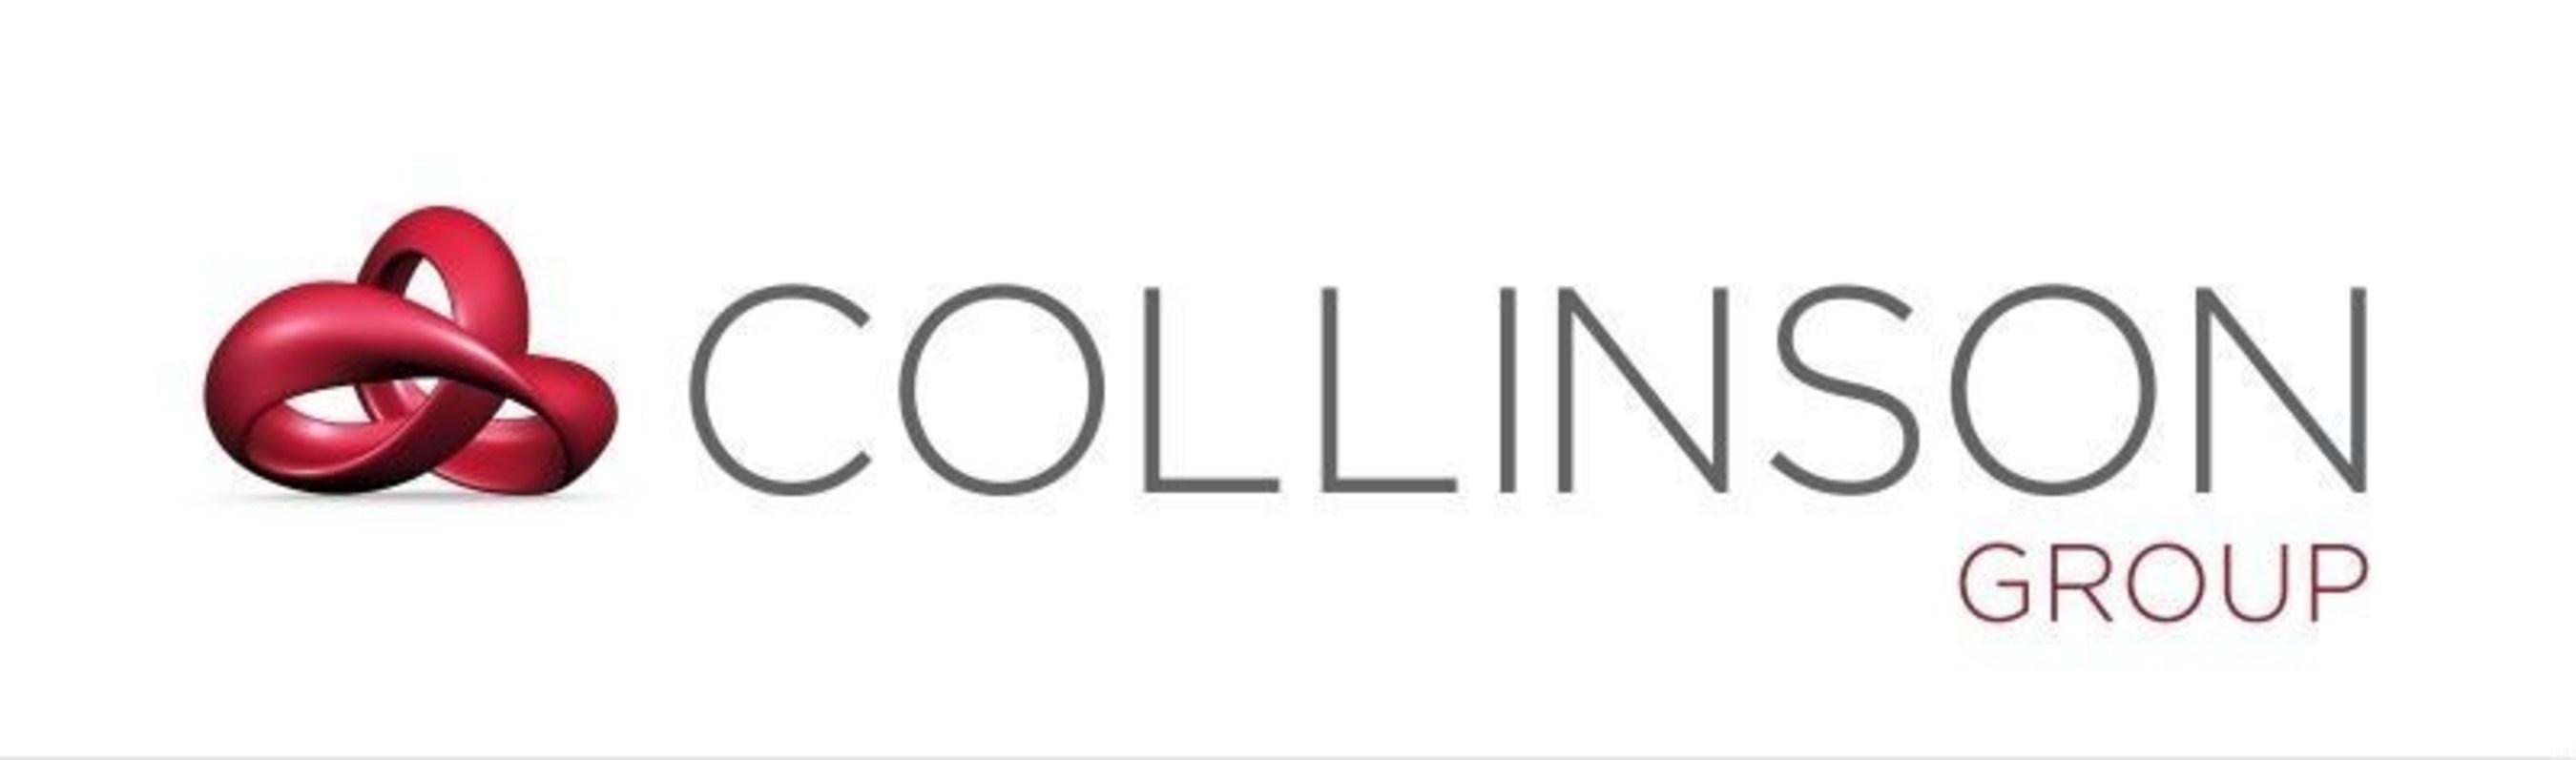 Collinson Group Logo (PRNewsFoto/Collinson Group) (PRNewsFoto/Collinson Group)